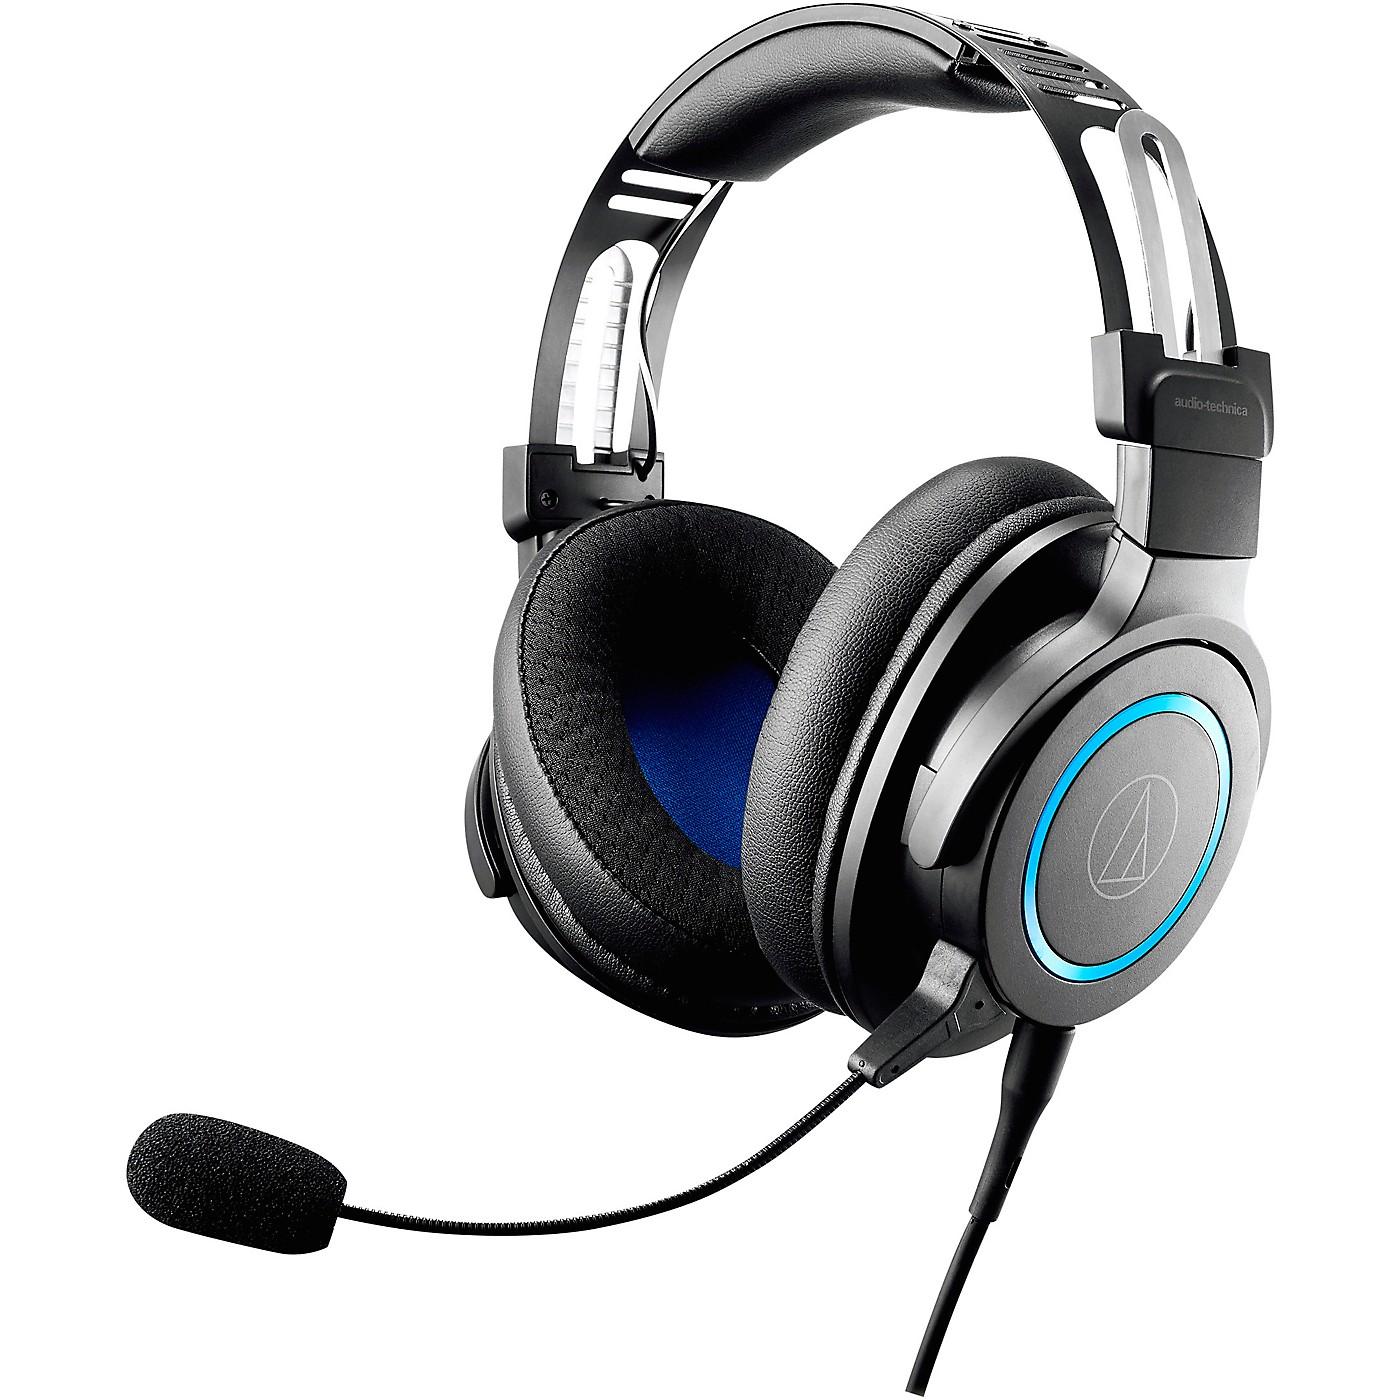 Audio-Technica ATH-G1 Premium Gaming Headset thumbnail